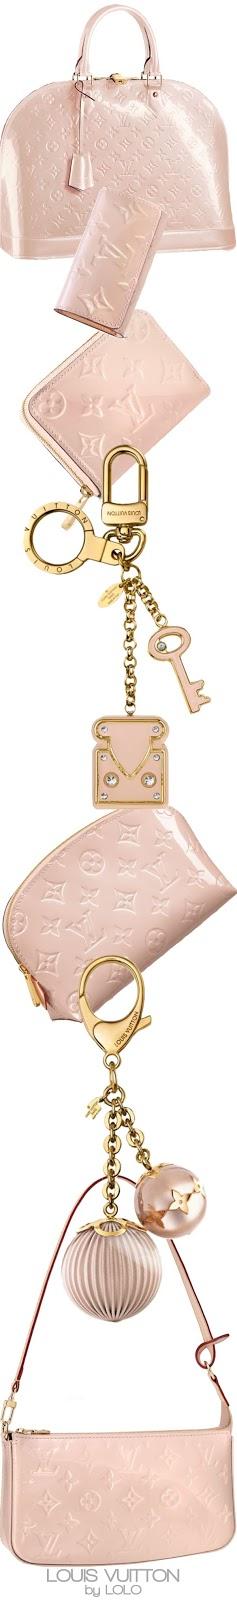 Desejo do dia - Acessorios Louis Vuitton, mala porta chaves,